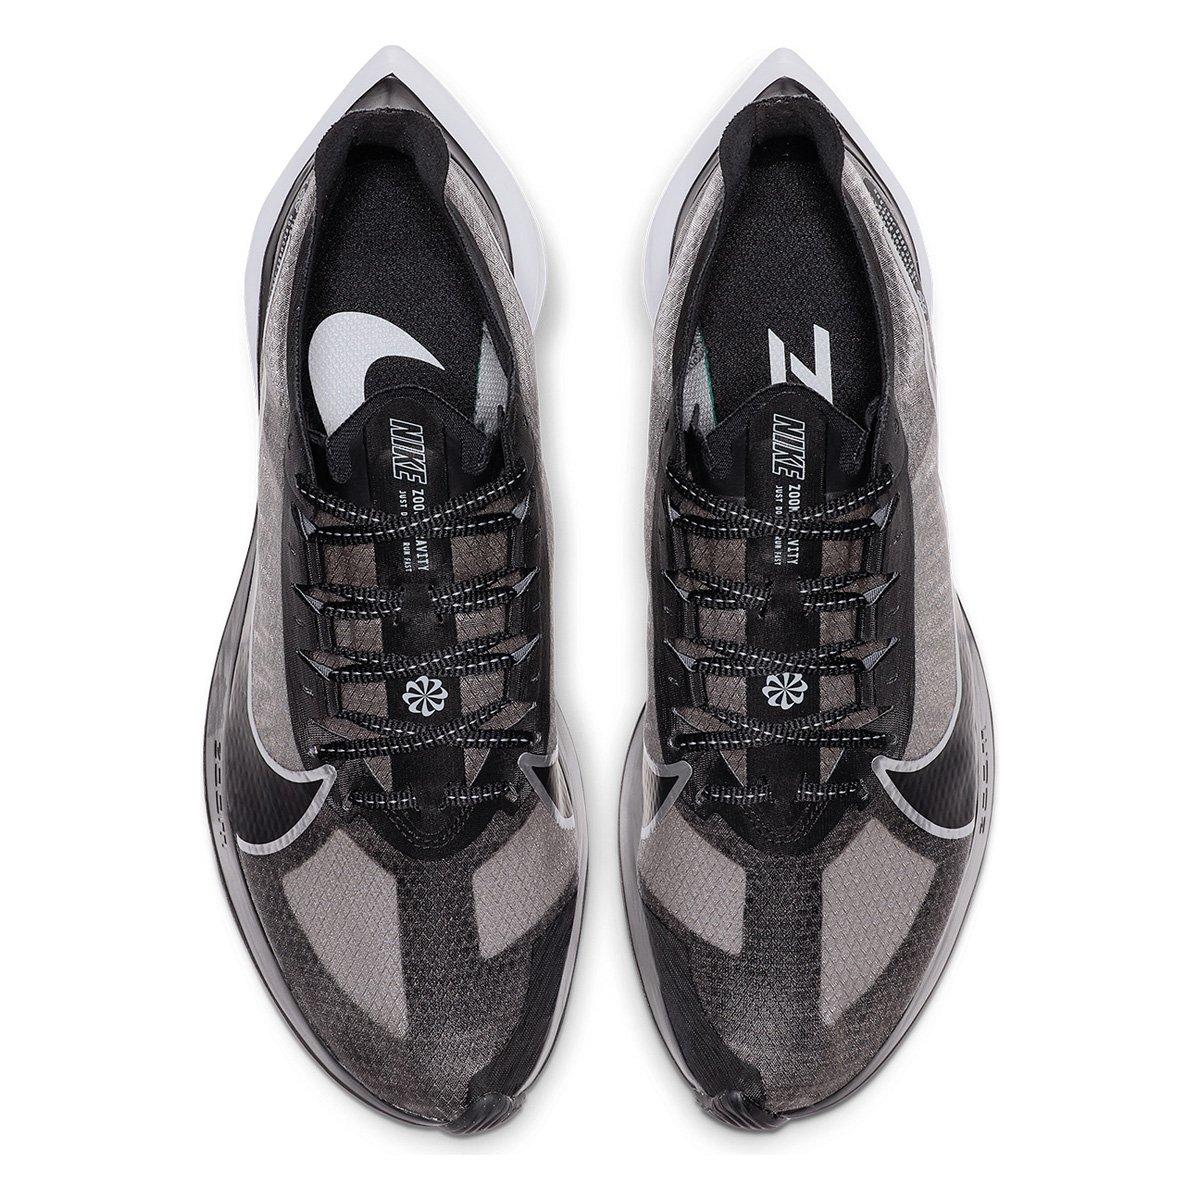 Tênis Nike Zoom Gravity Masculino - Tam: 41 - 1